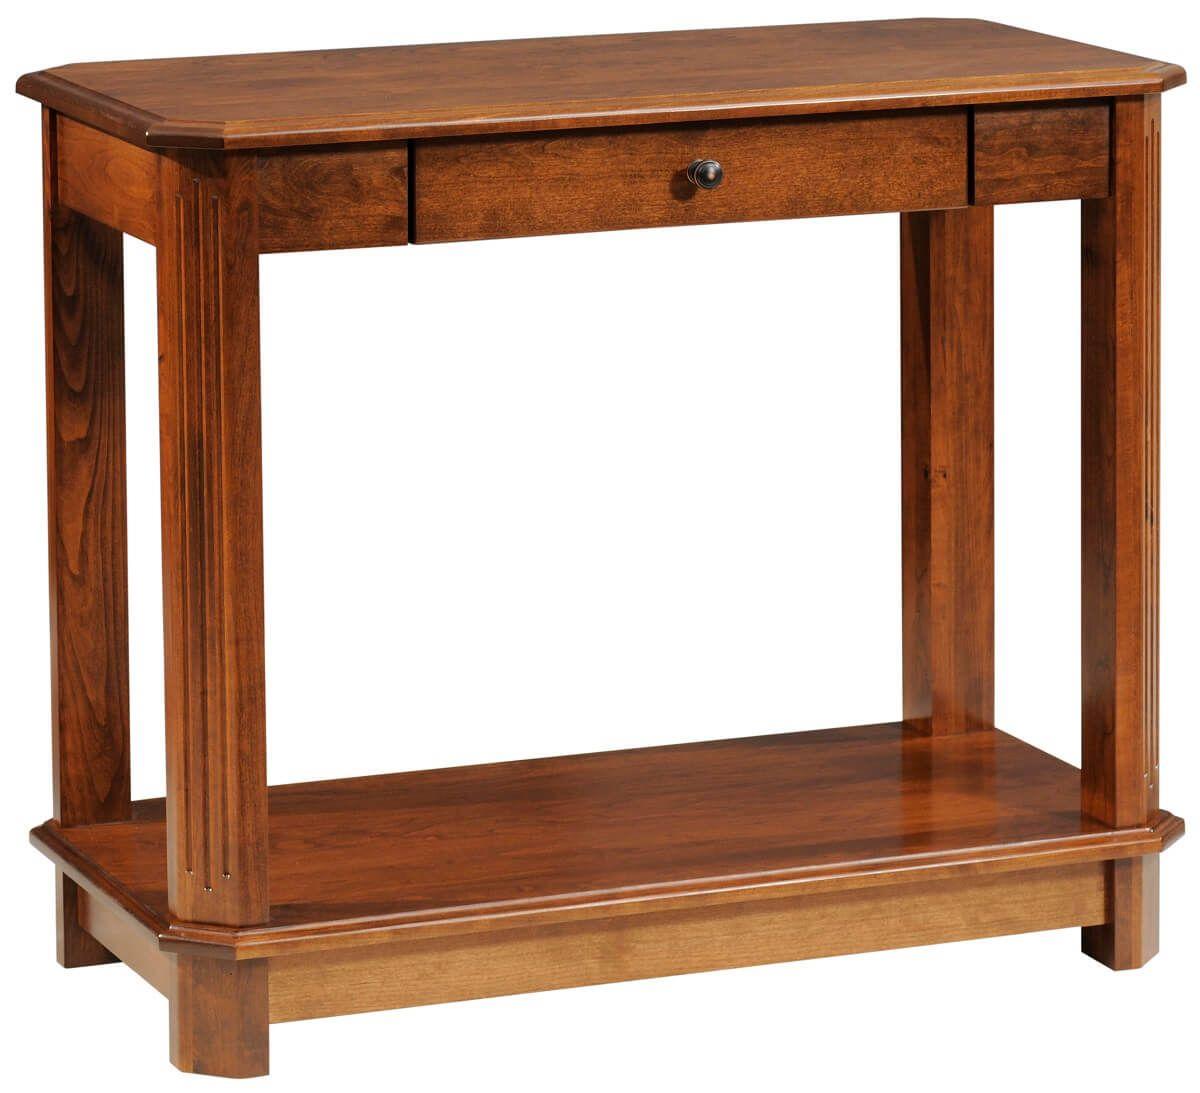 Manero Sofa Table